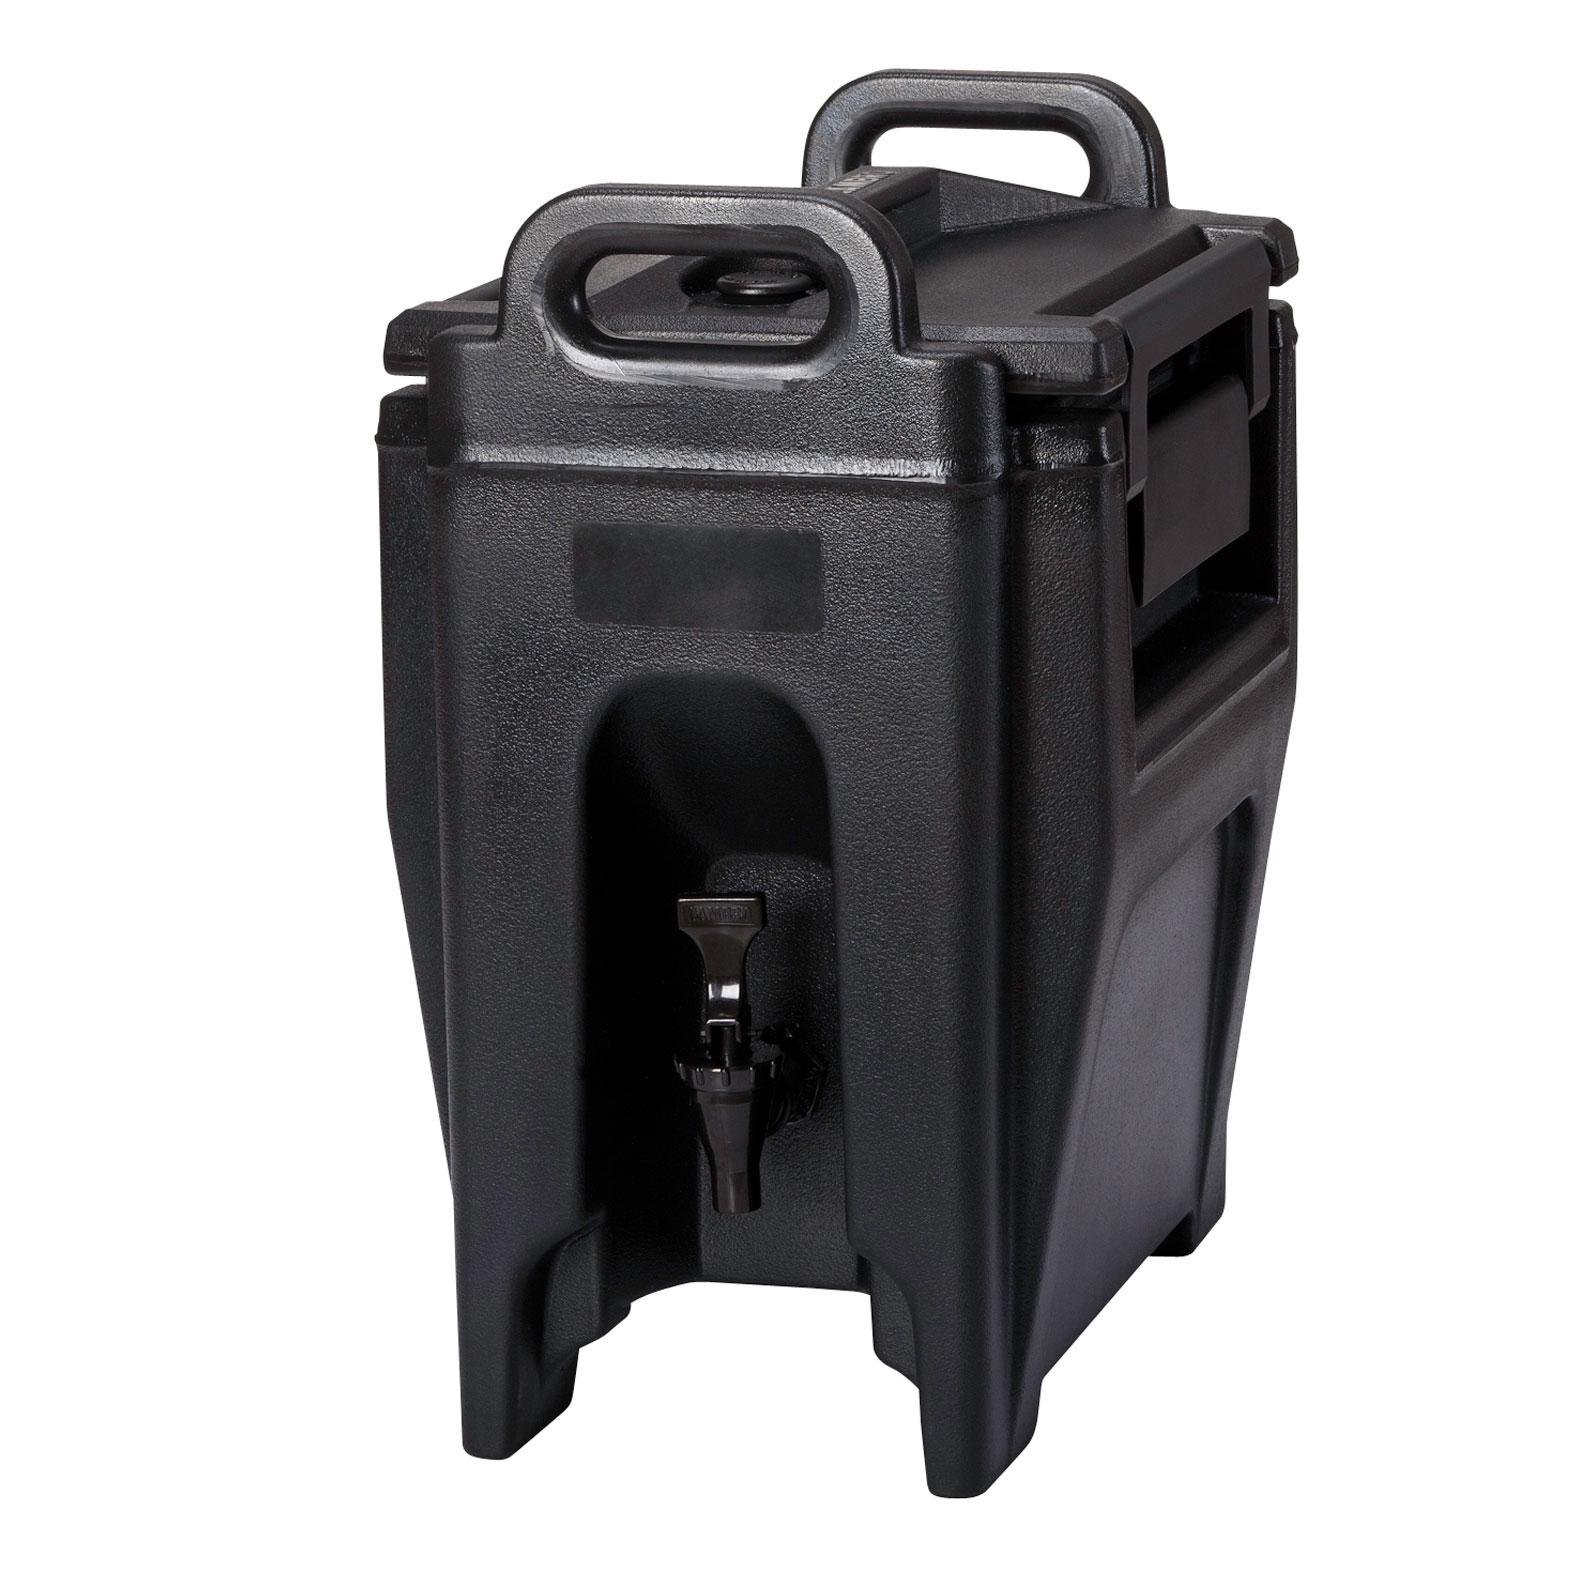 Cambro UC250110 beverage dispenser, insulated